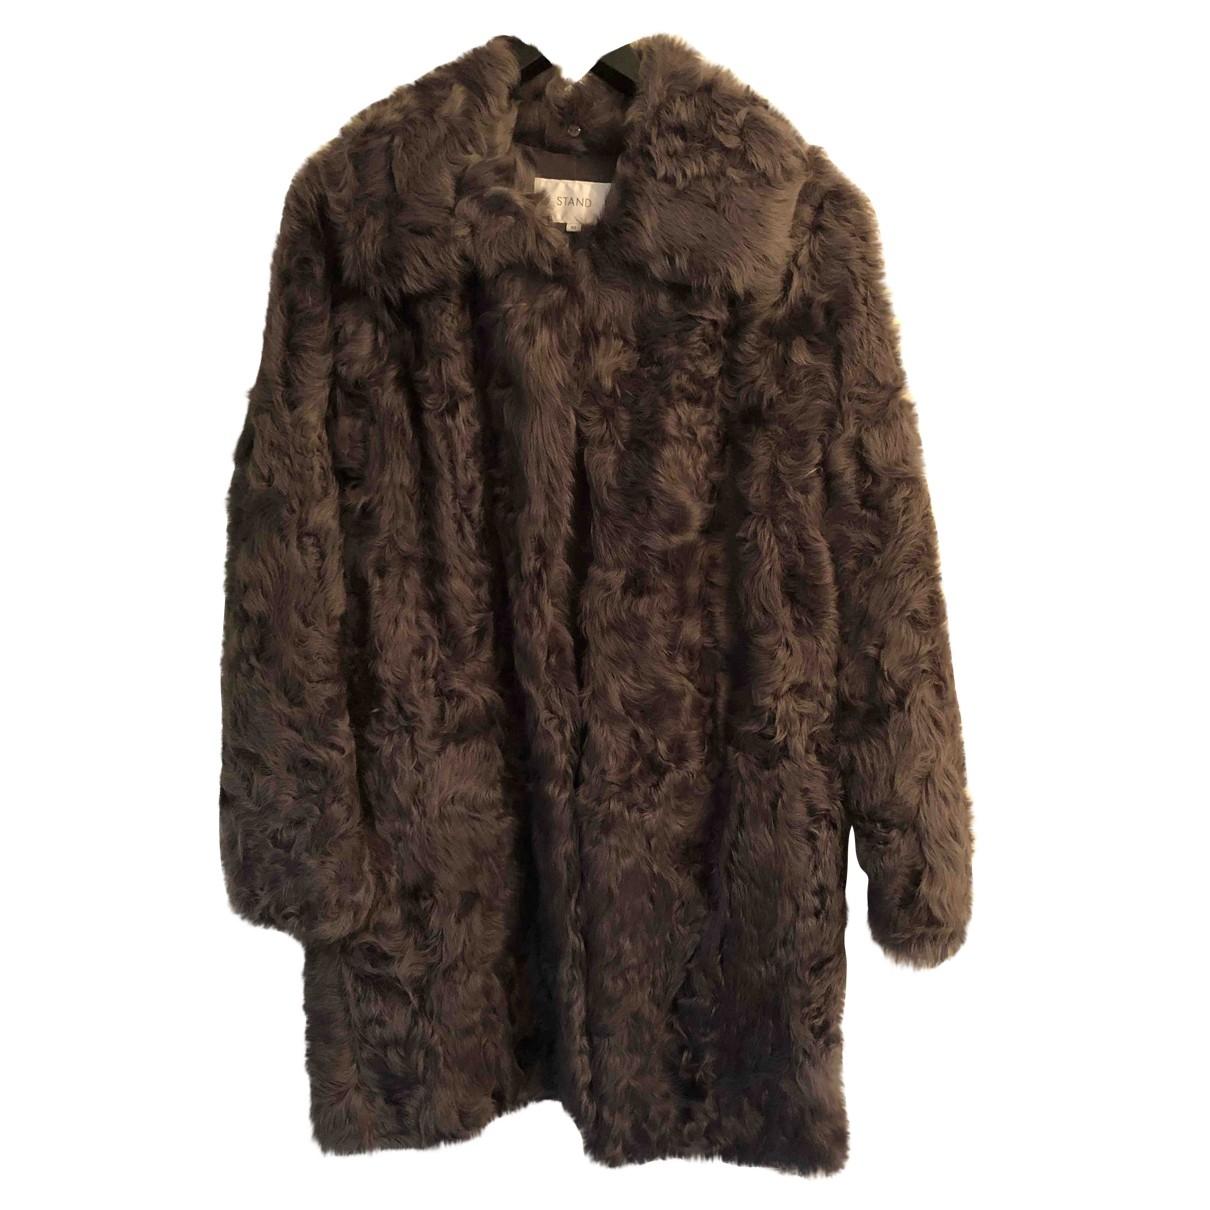 Stand Studio \N Grey Shearling coat for Women S International